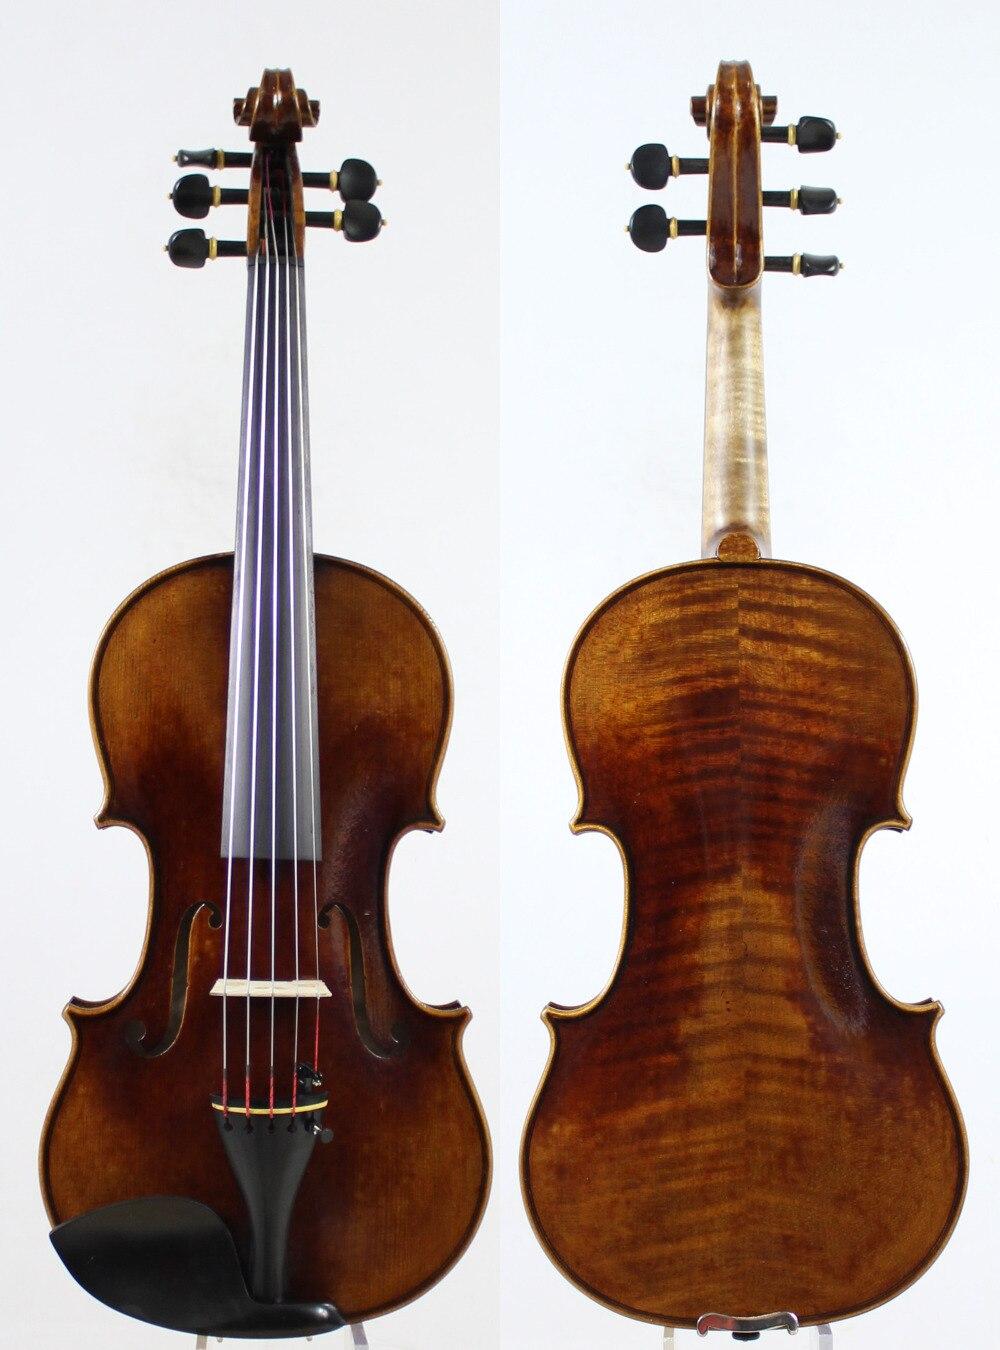 5 saiten Violine violino! Kopie Stradivaris 1715 Modell! Antiqued öl lack. Master Ton! Fall Bogen Kolophonium! Freies Verschiffen! Aubert Brücke!